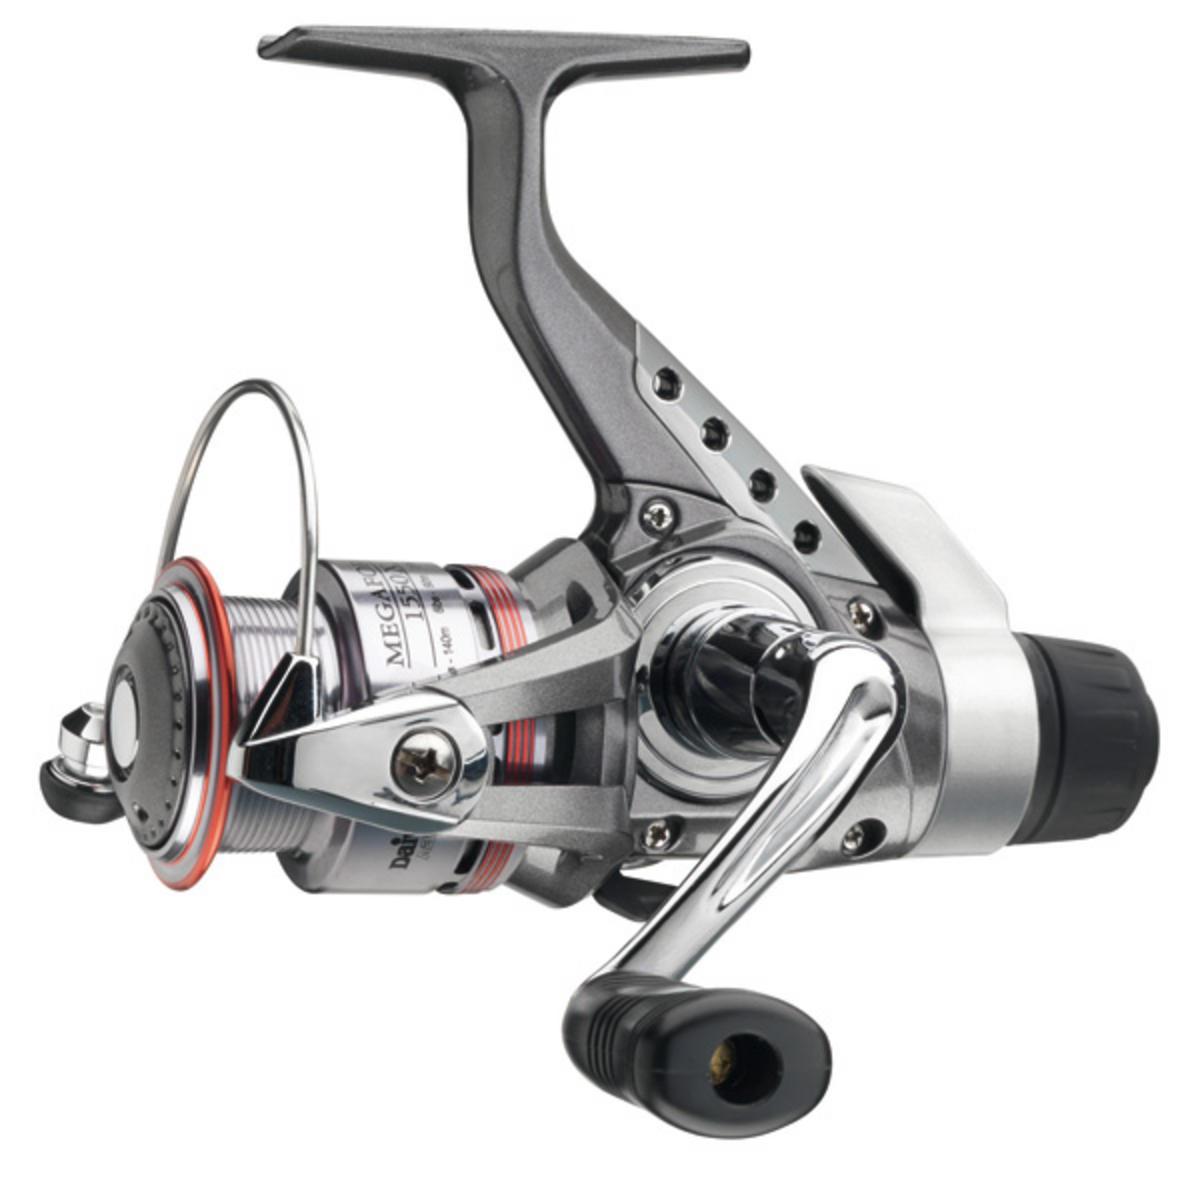 DAIWA MEGAFORCE 2050X Model No MF2050X FISHING REEL